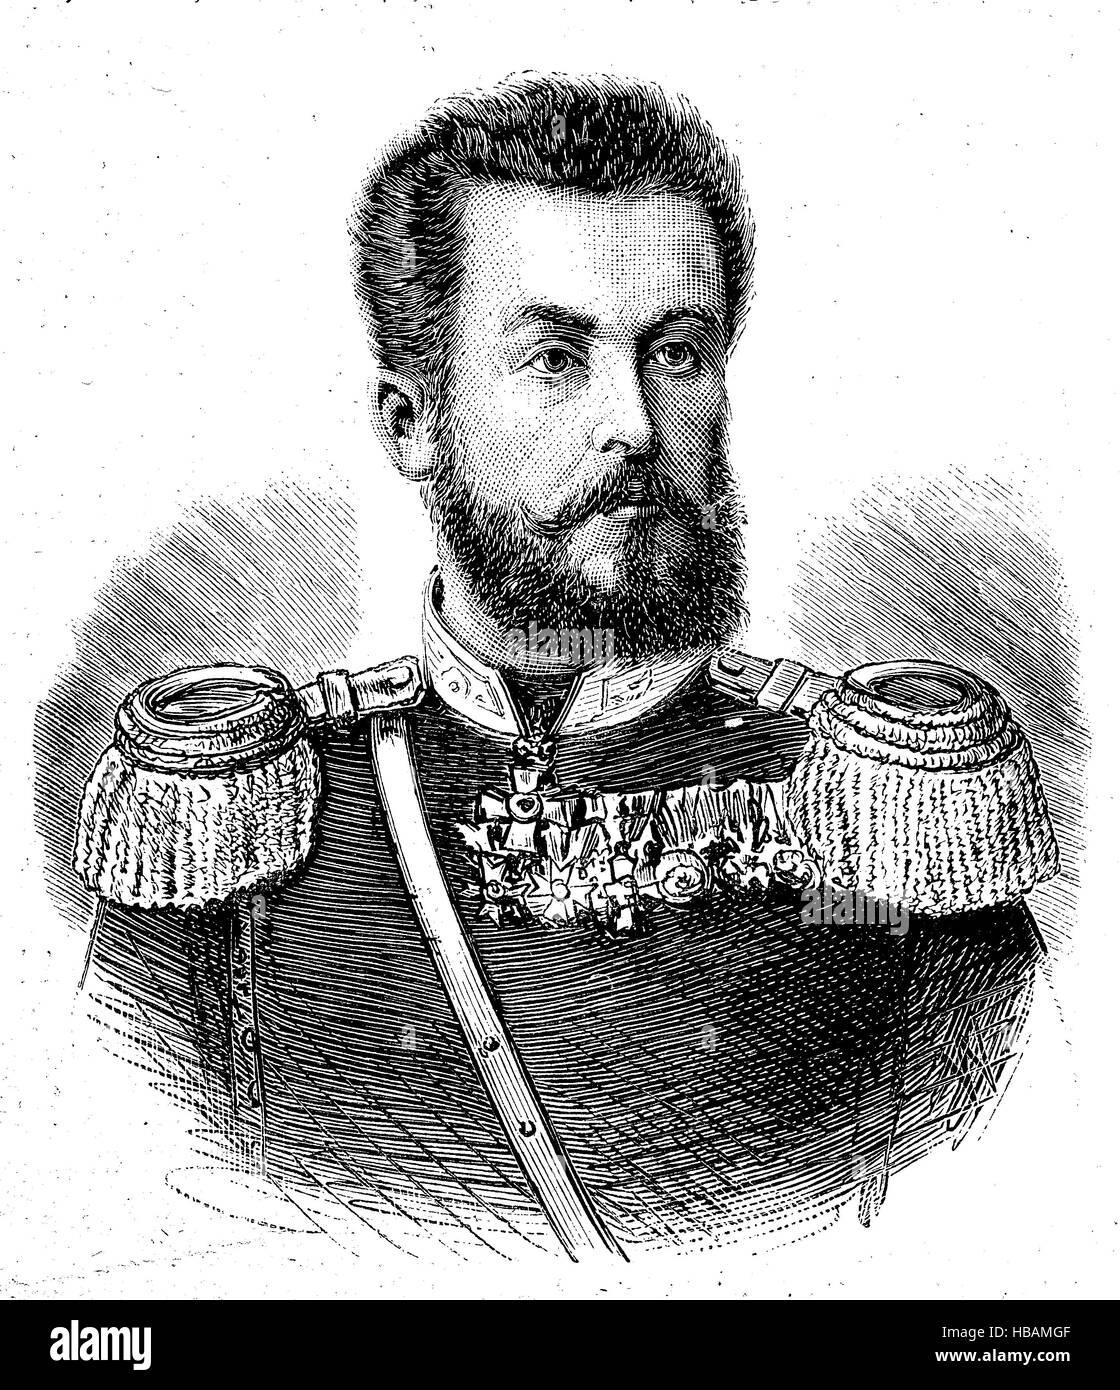 Konstantin Atanasow Panica, 1857 - 1890, known under his nickname Kosta Panica was a Bulgarian freedom fighter and - Stock Image